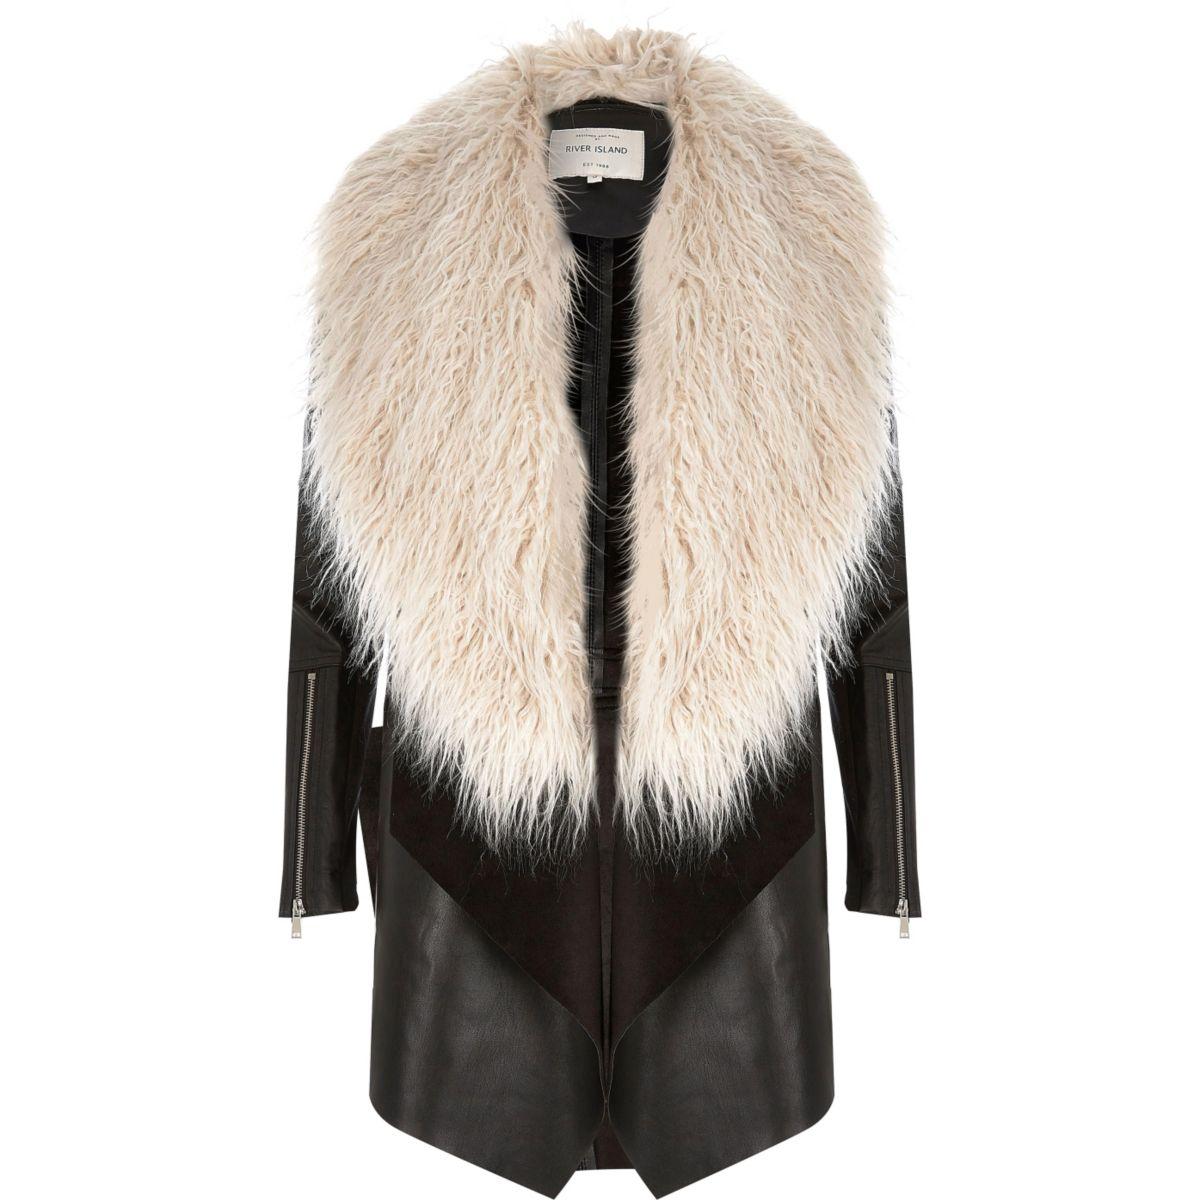 River Island Fur Coat Limited Edition